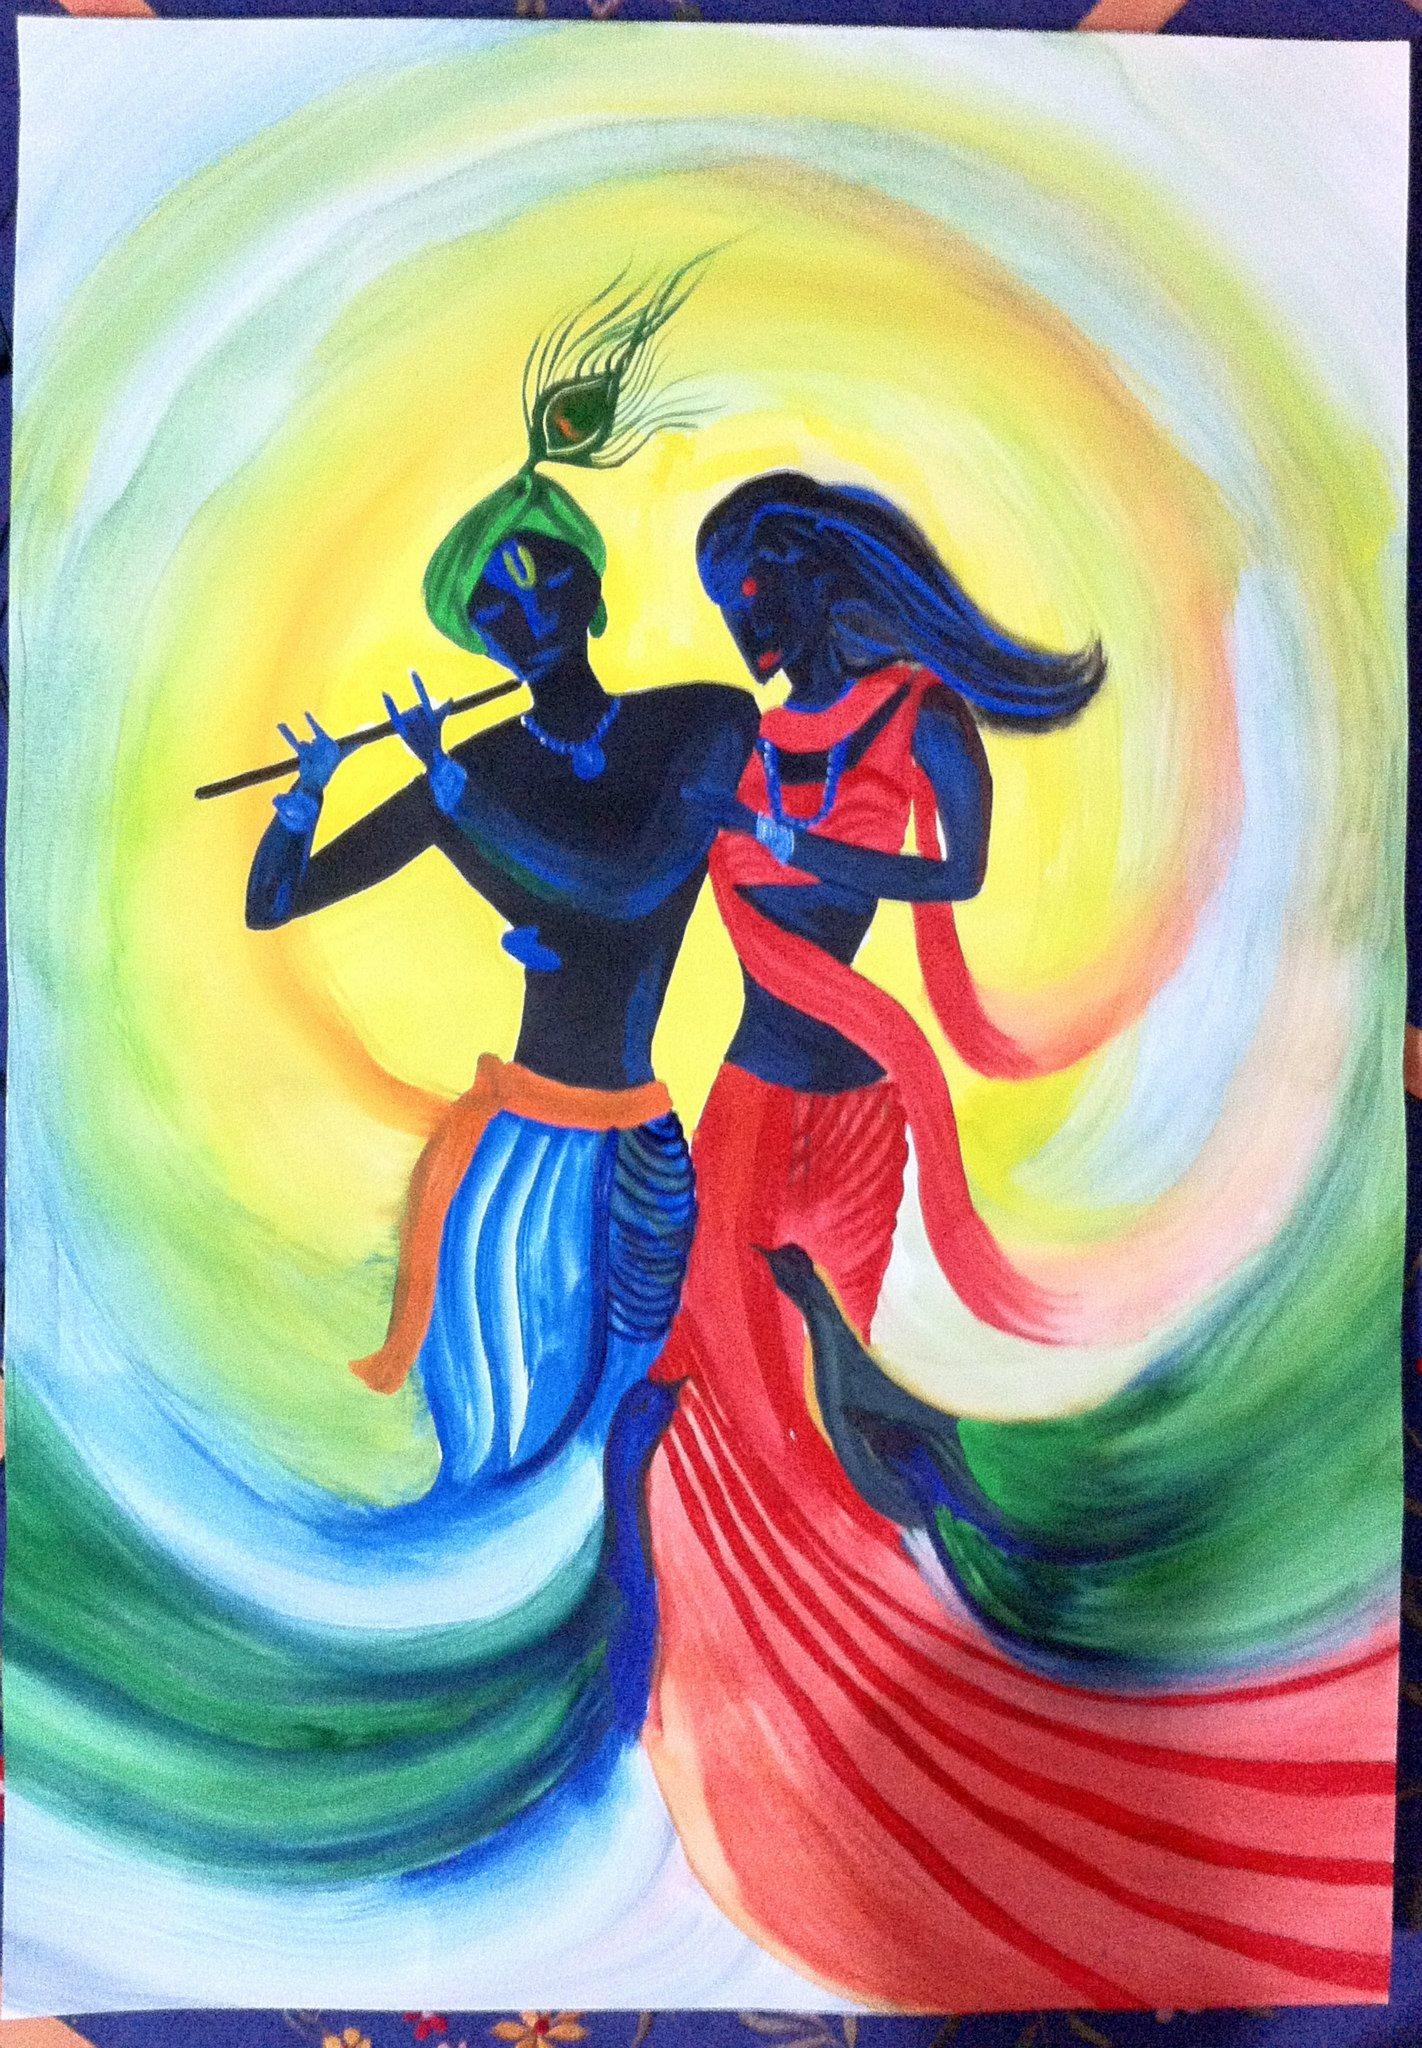 Marathi Girl Hd Wallpaper Paintings Designgalaxy